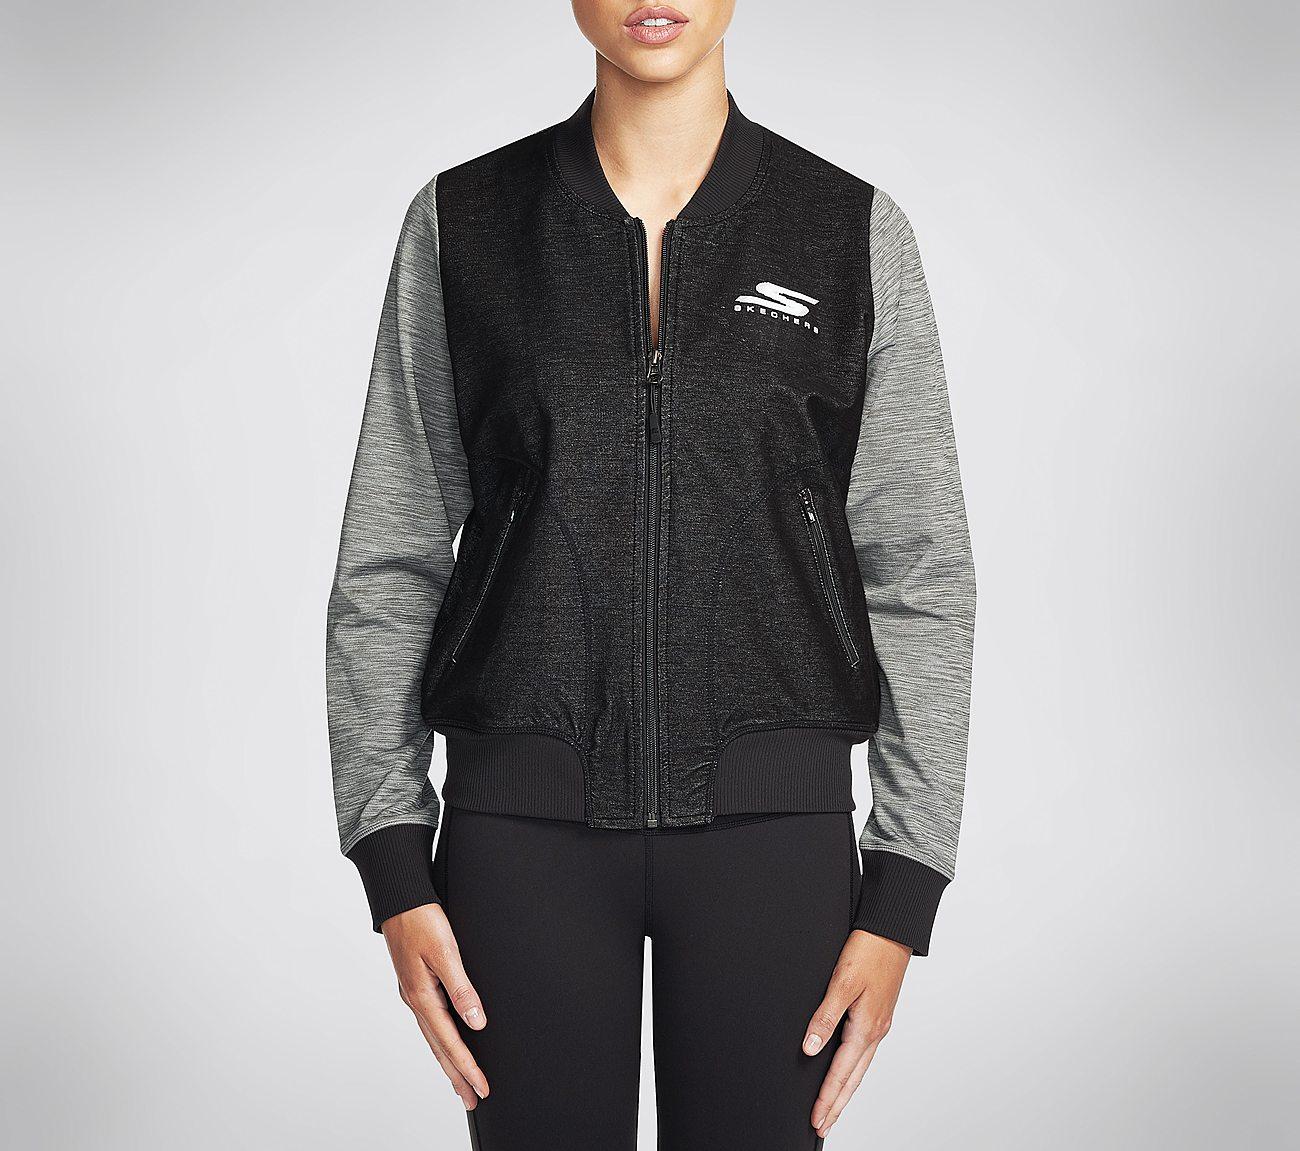 skechers jacket